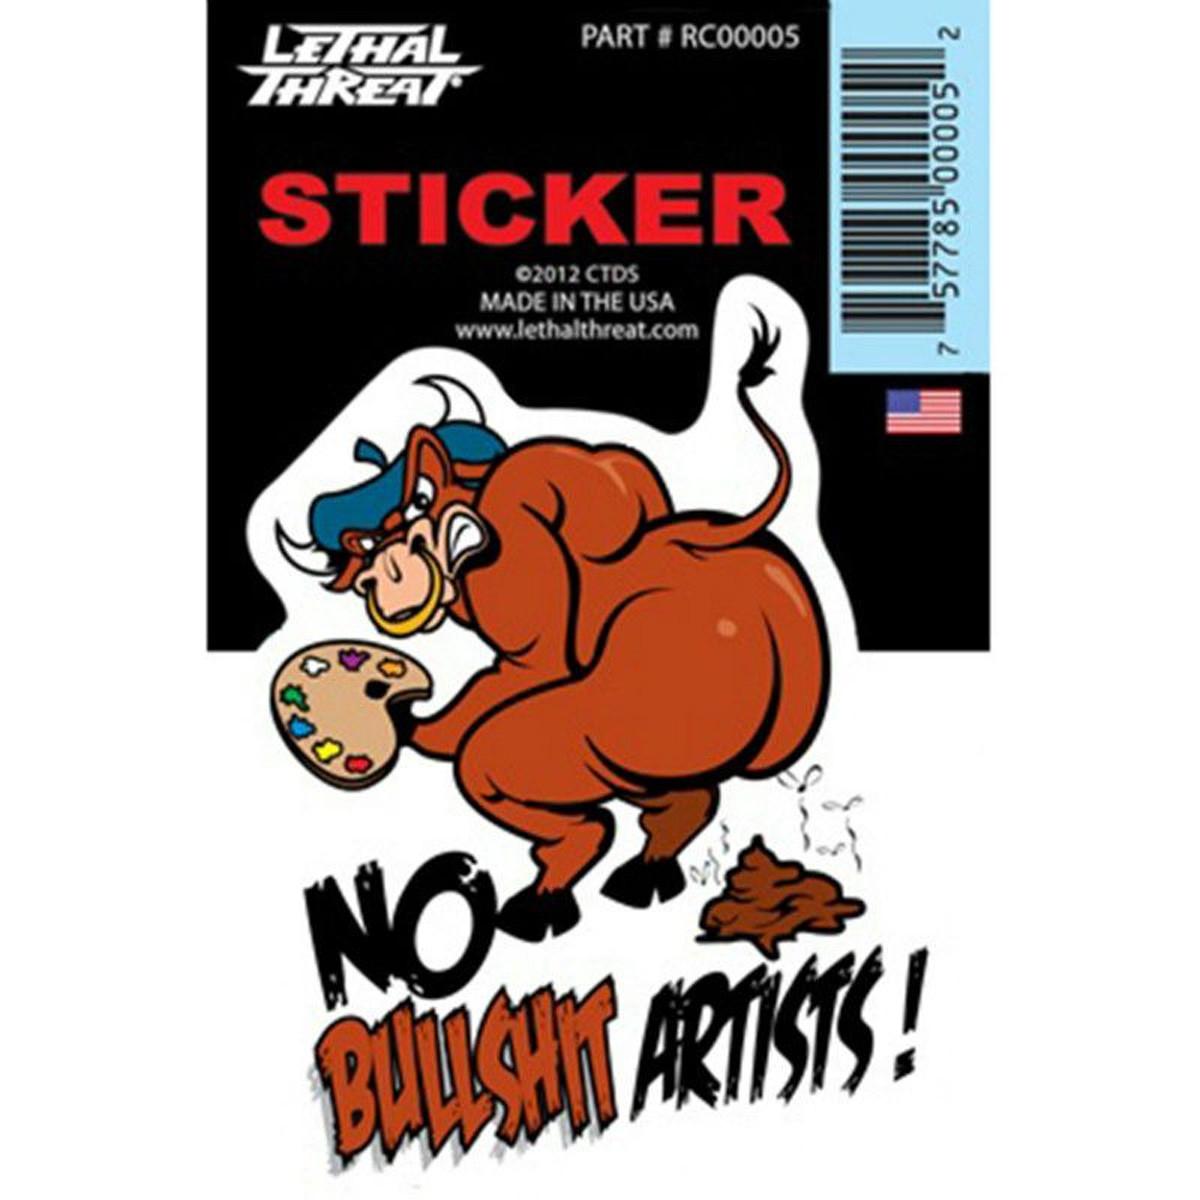 Autocollant / Sticker - LETHAL THREAT Mini Vilain Bull Shit 6 x 8cm